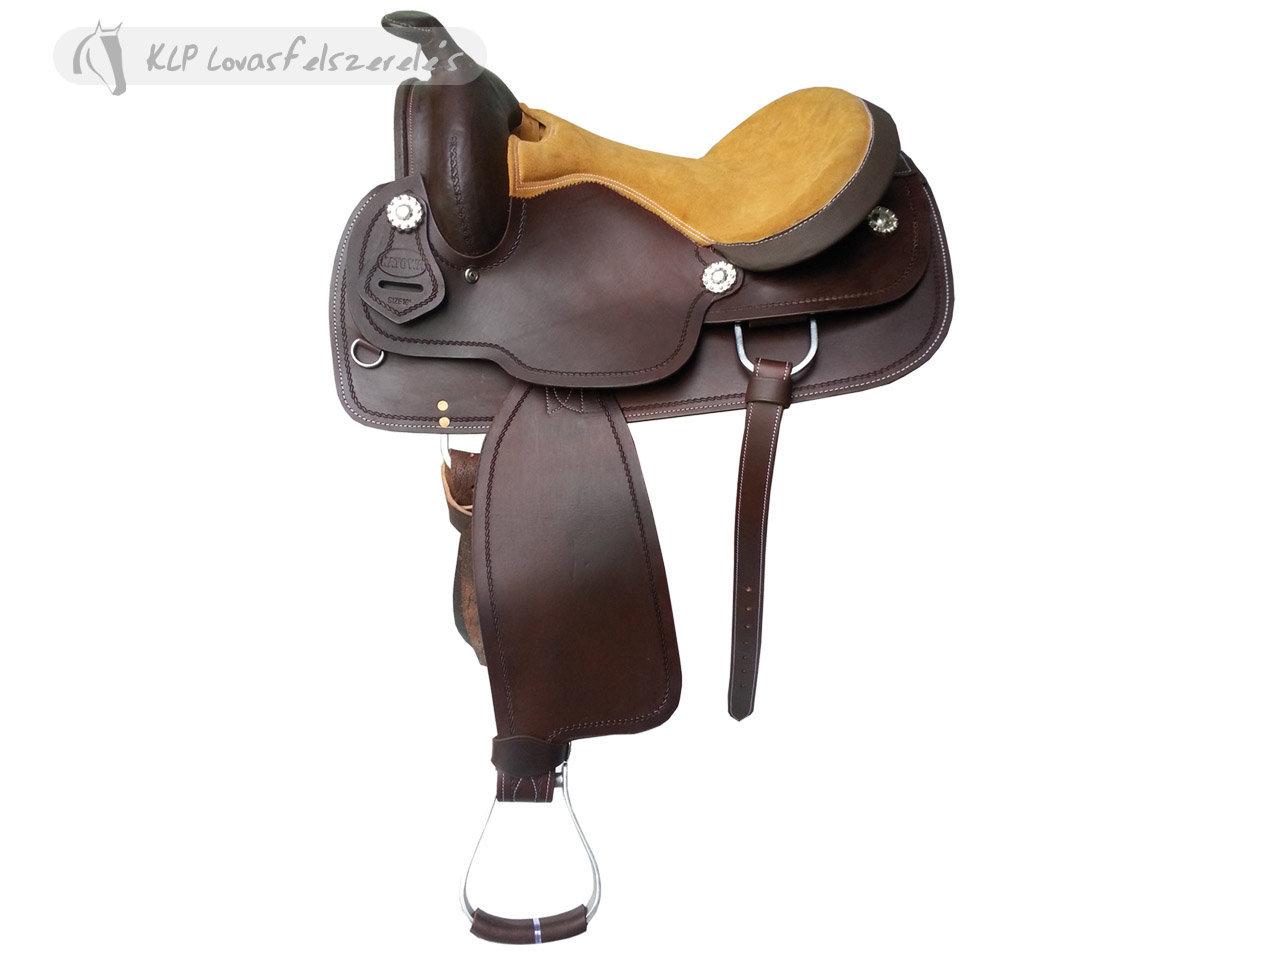 Natowa Saddle N.142 Smooth Leather